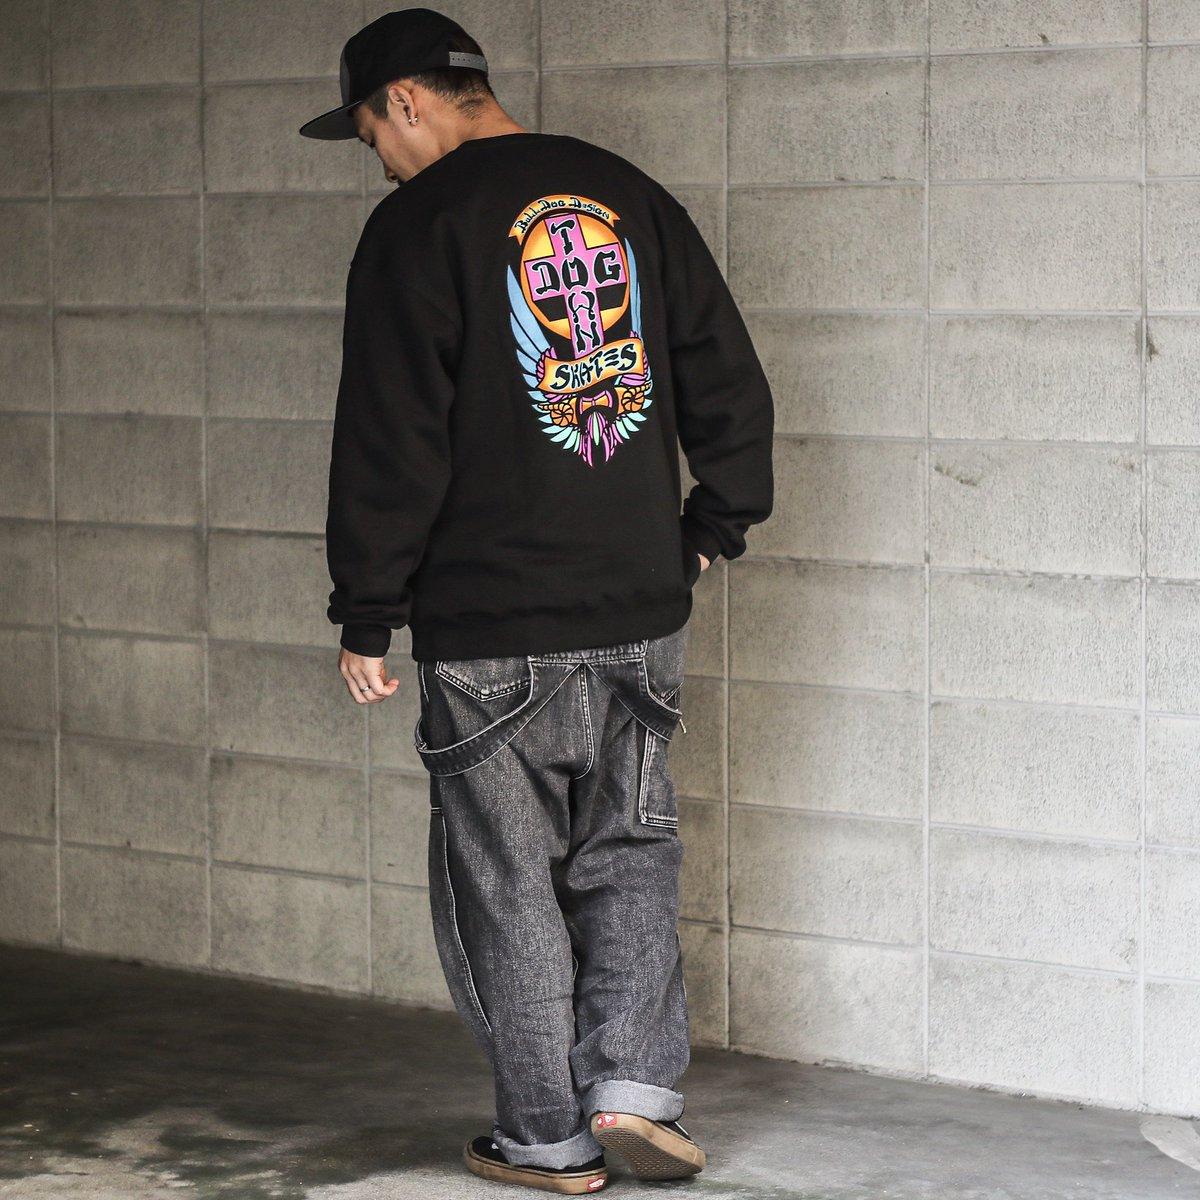 【DOGTOWN】BULL DOG CREWNECK SWEAT (BLACK) Lサイズ https://shop.feelin-osaka.com/products/detail.php?product_id=8765… 80'sを彷彿させる鮮やかなリミテッドカラーのクルーネックスウェット。 オールドスケート好きにはたまりませんね! #dogtown #dogtownskates #ドッグタウン #crewneck #sweat #streetwear #streetstyle #streetfashionpic.twitter.com/GZGRFdoPea